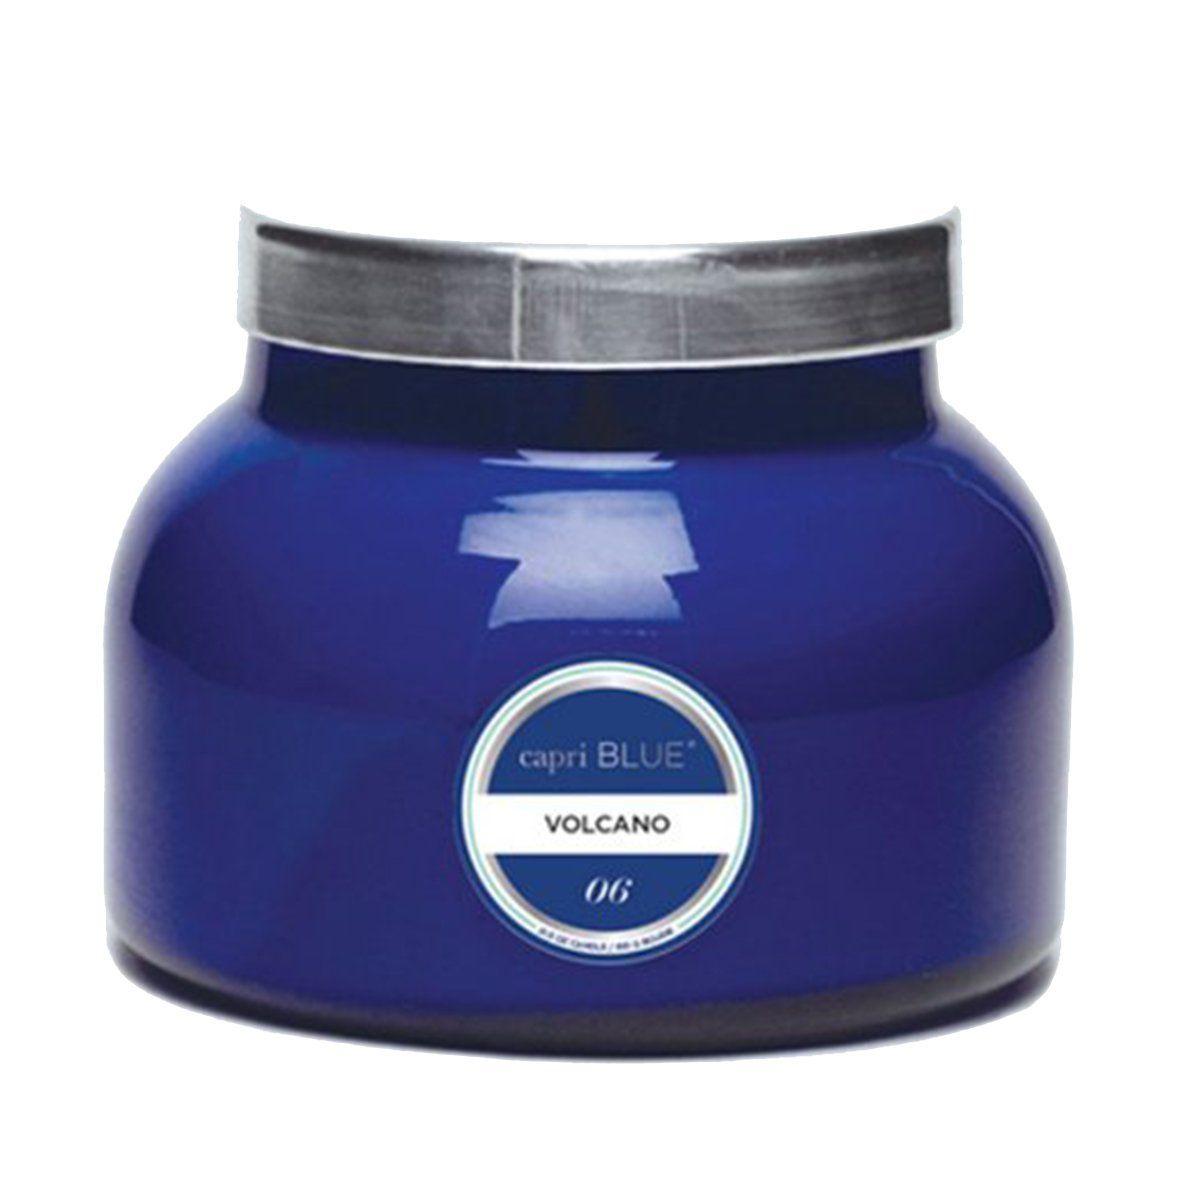 Aspen Bay Jar Volcano Candle, 21.5 Ounce, Capri Blue